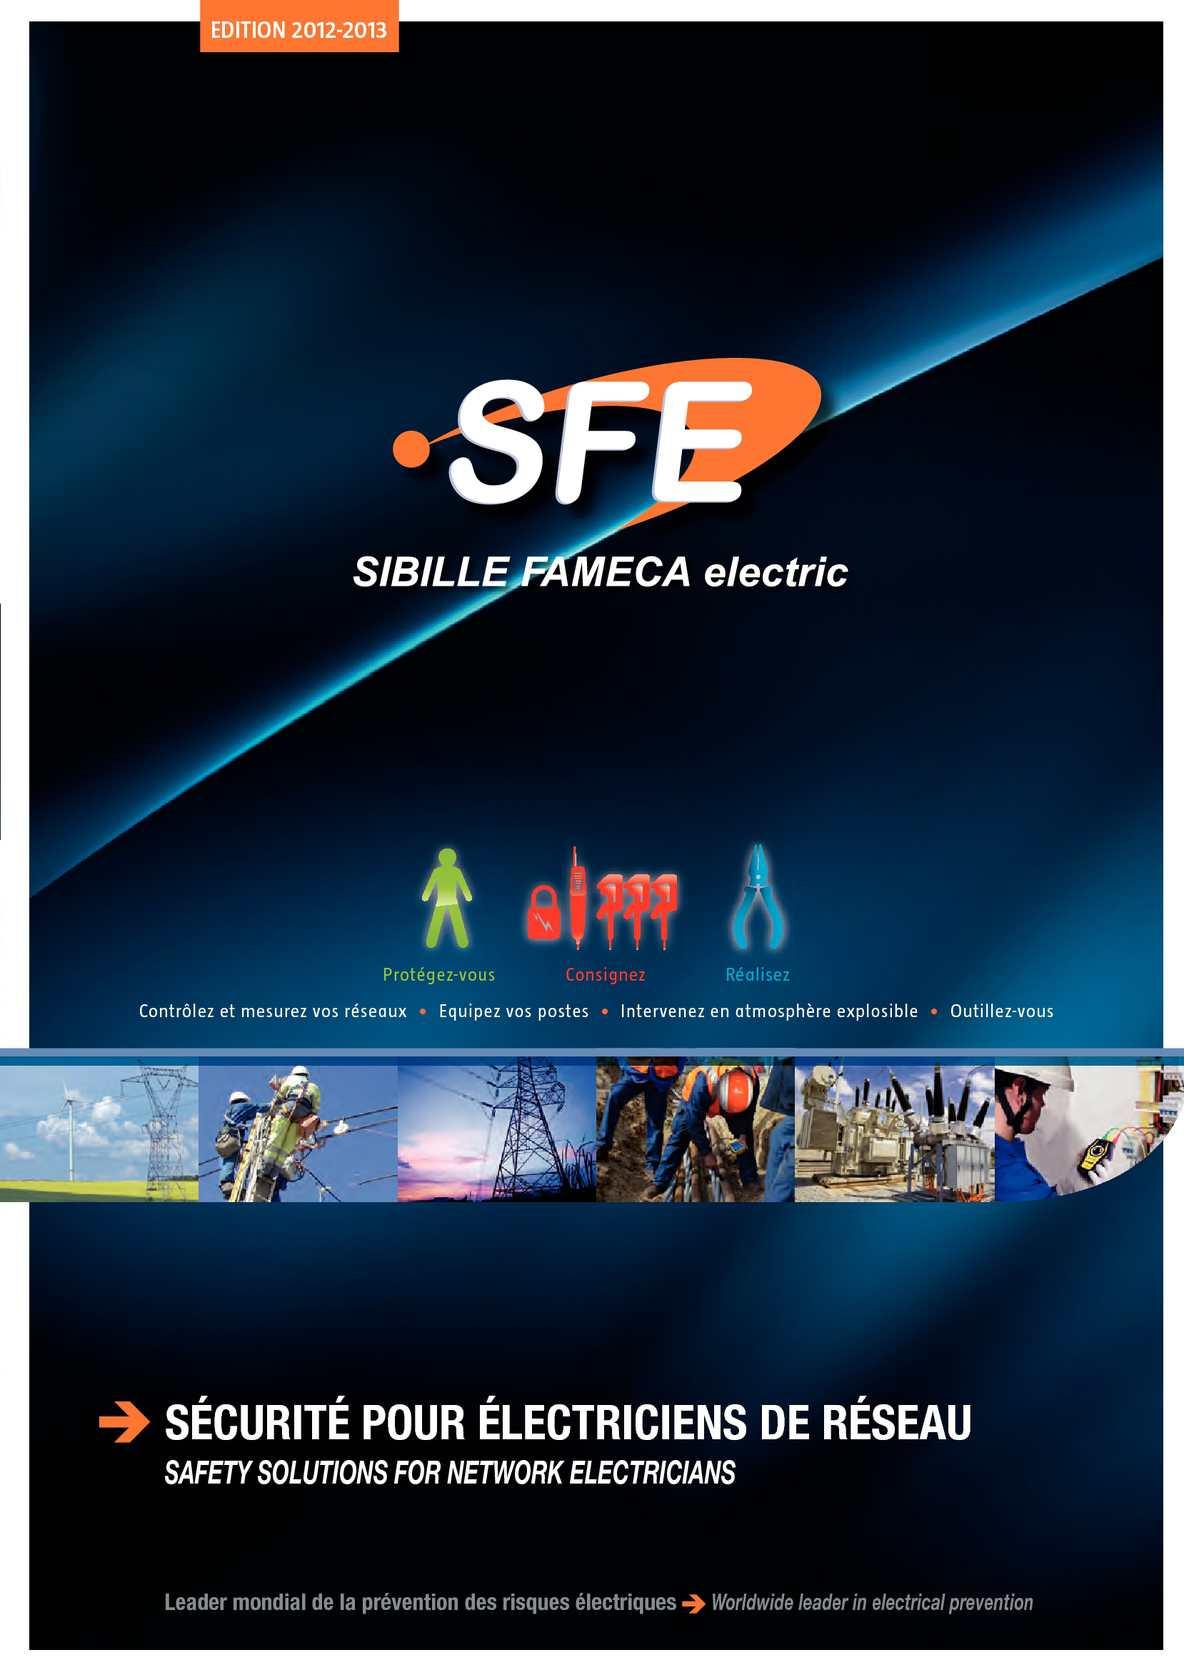 Etude De Marche Artisan Electricien calaméo - catalogue général sibille fameca electric 2012-2013